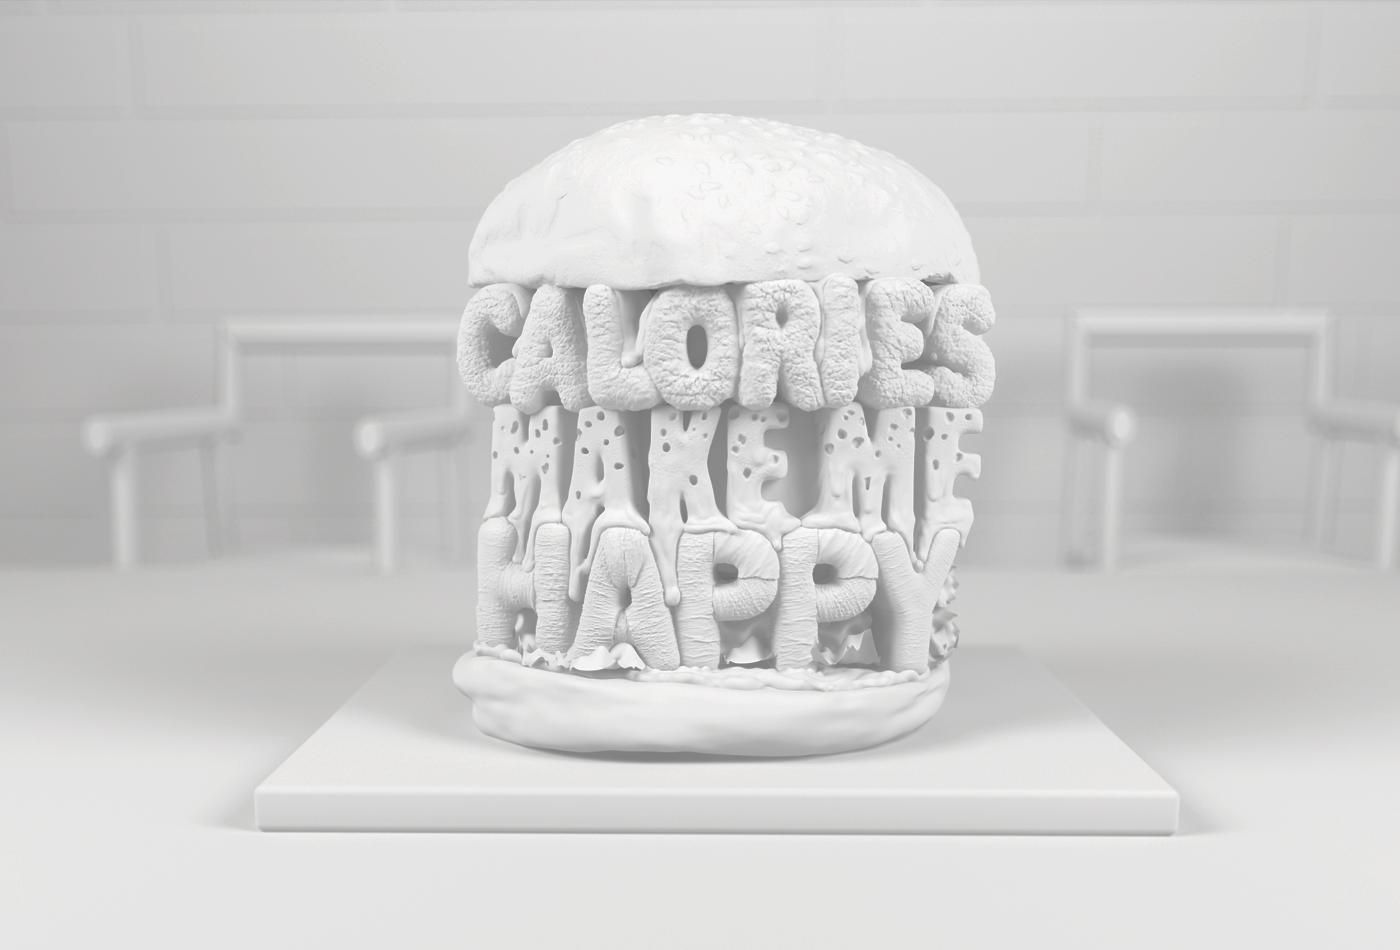 3D LETTERING TYPE BURGER 3DTYPE 3DARTIST MCDONALDS BURGERKING